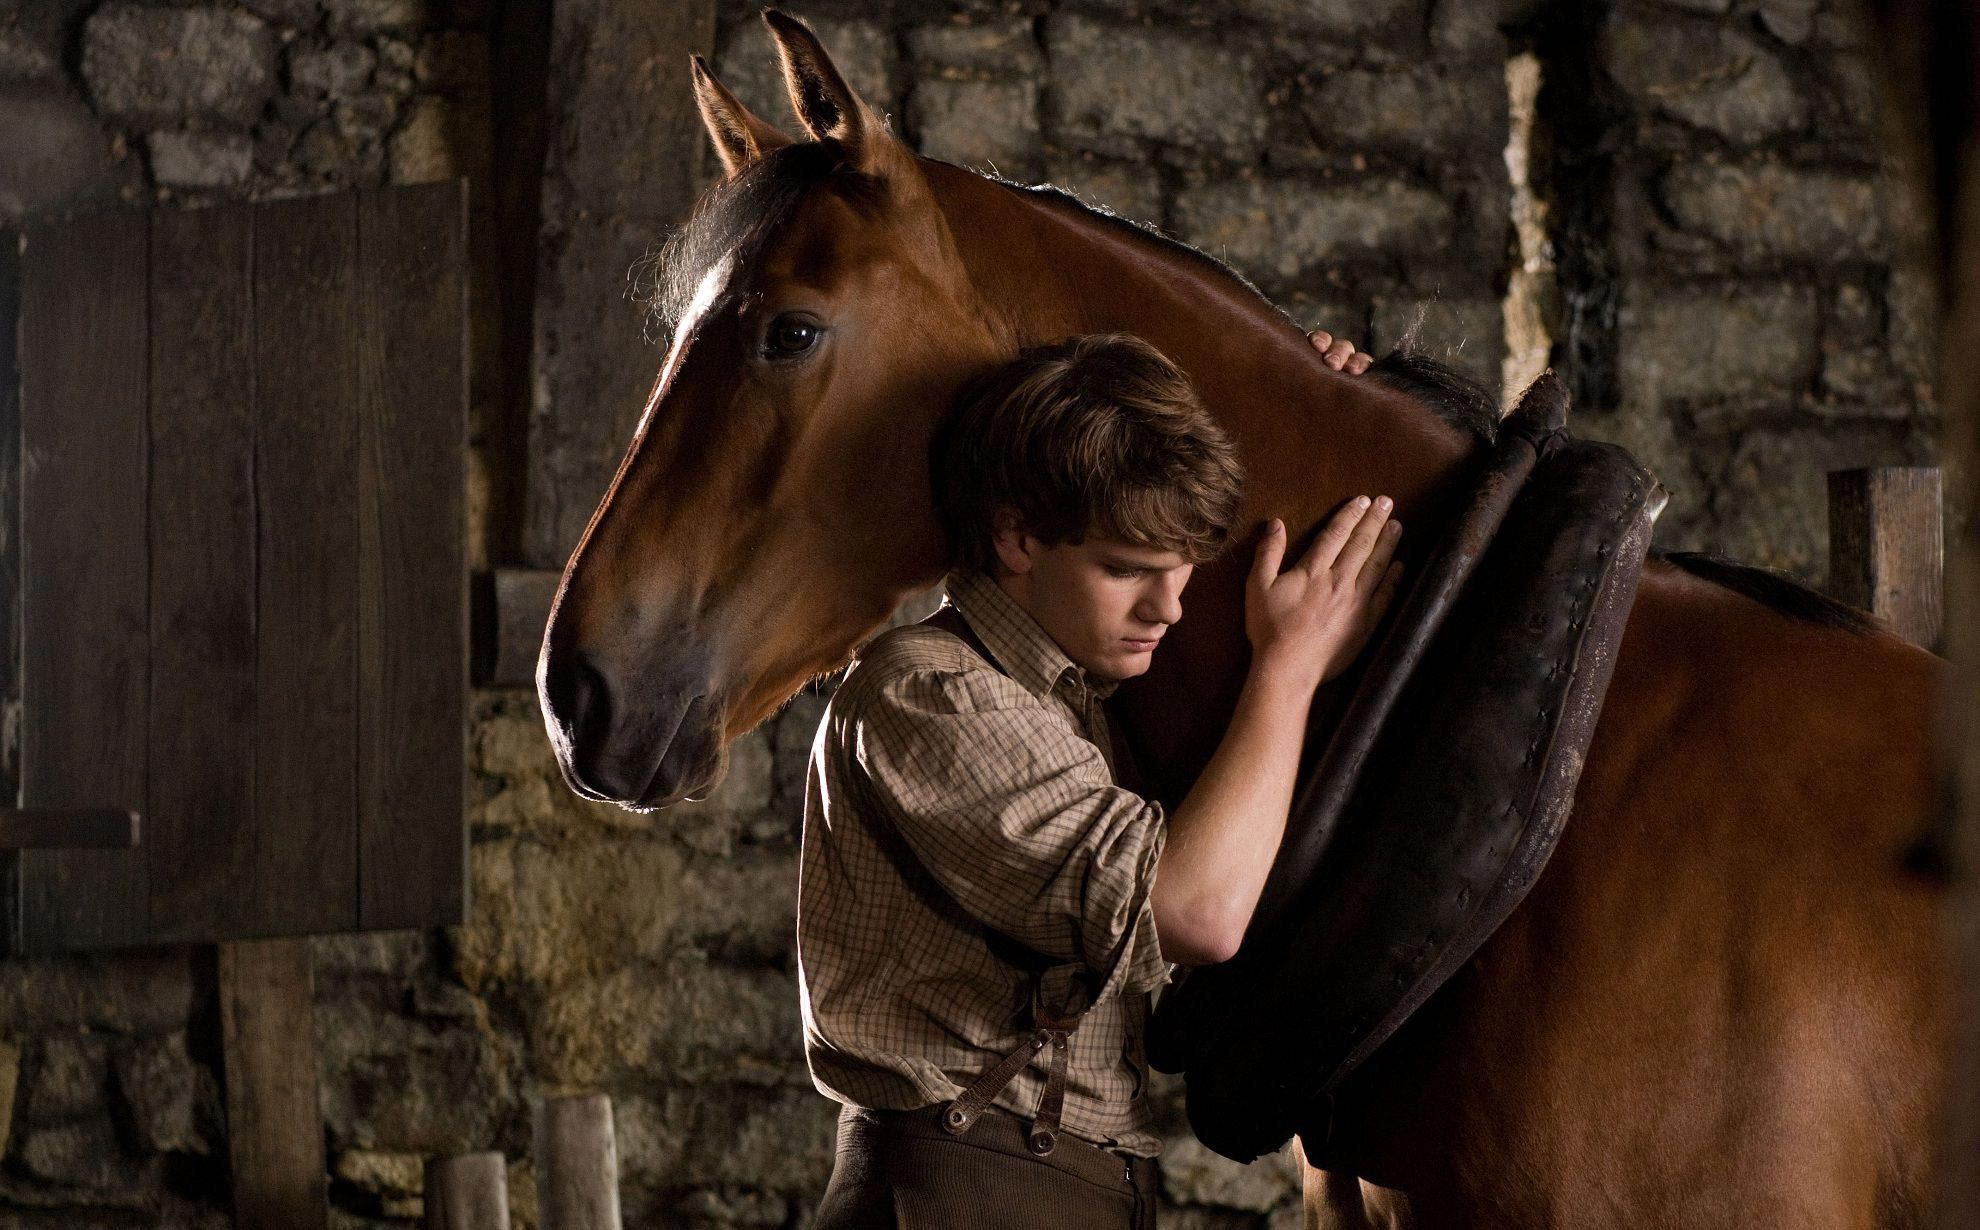 An image from War Horse